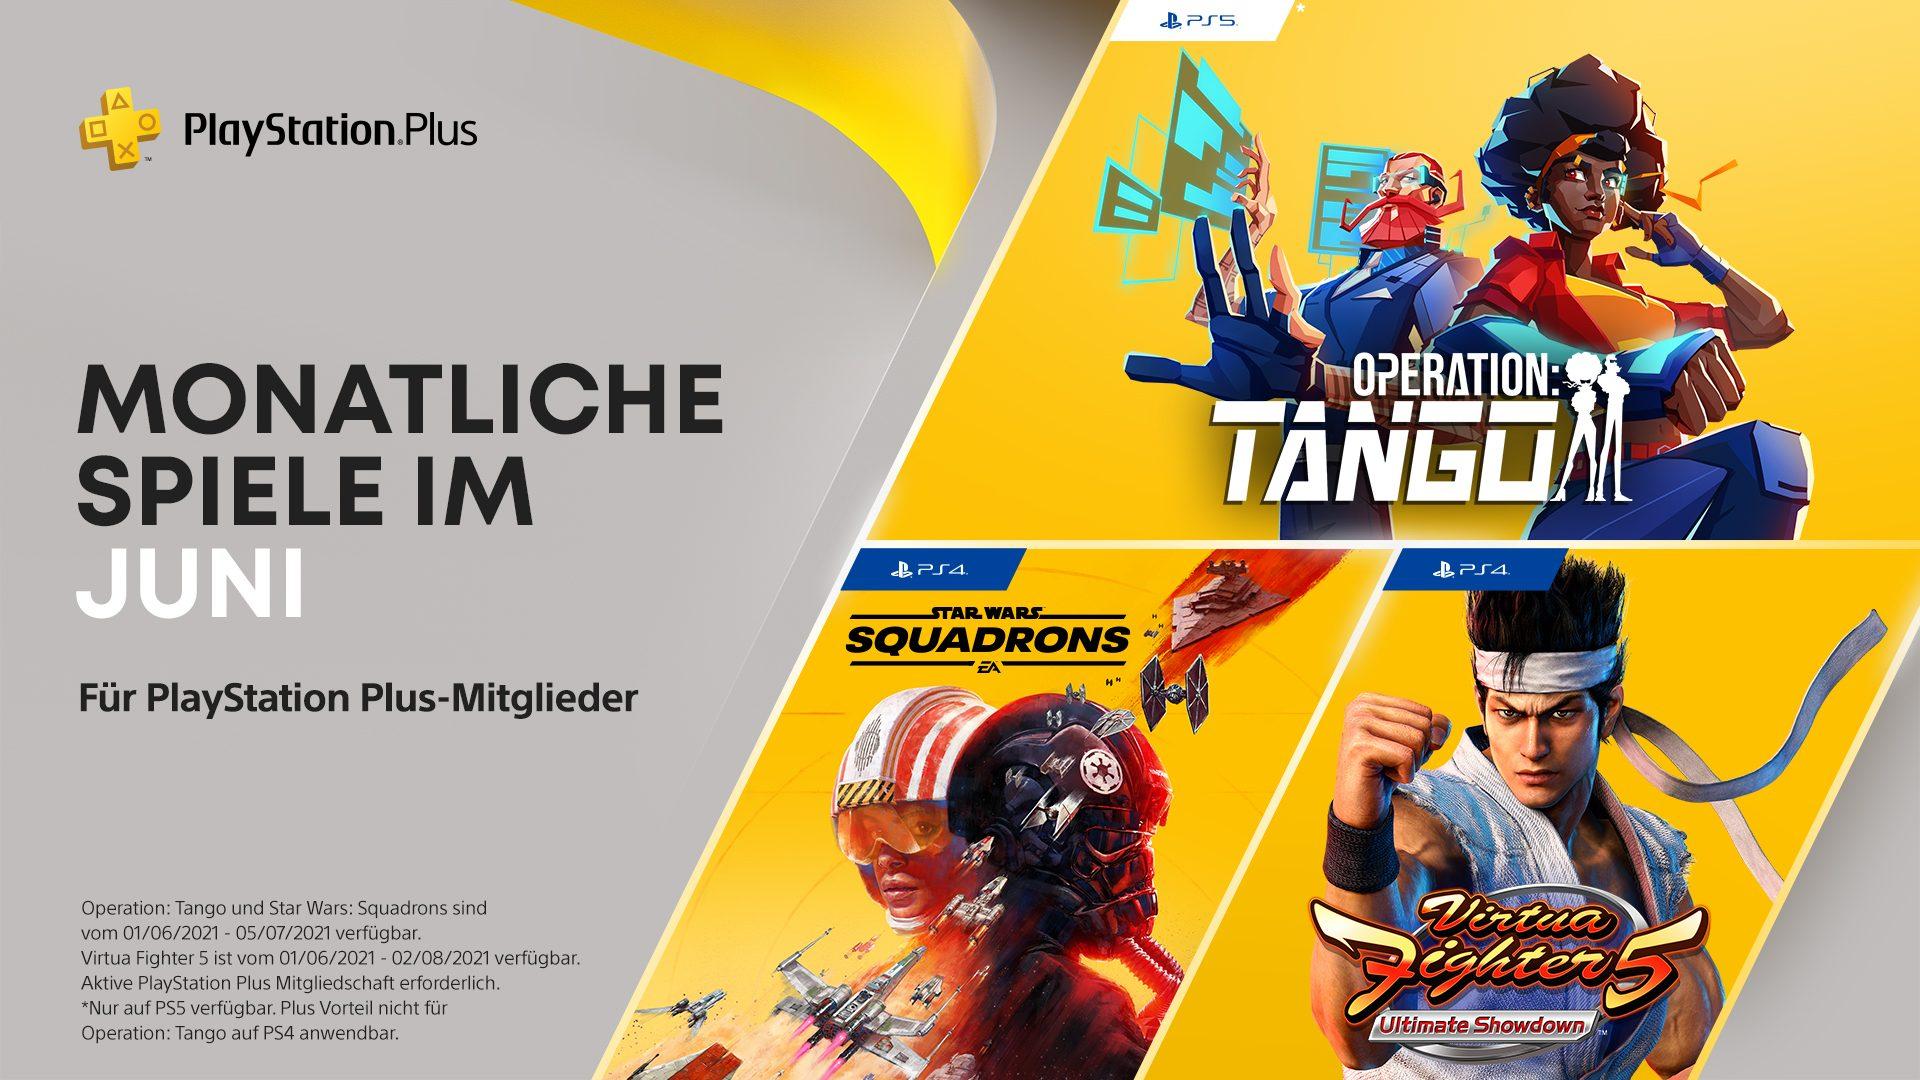 PS Plus Games im Juni: Operation Tango, Virtua Fighter 5: US, Star Wars: Squadrons (Infodeal)